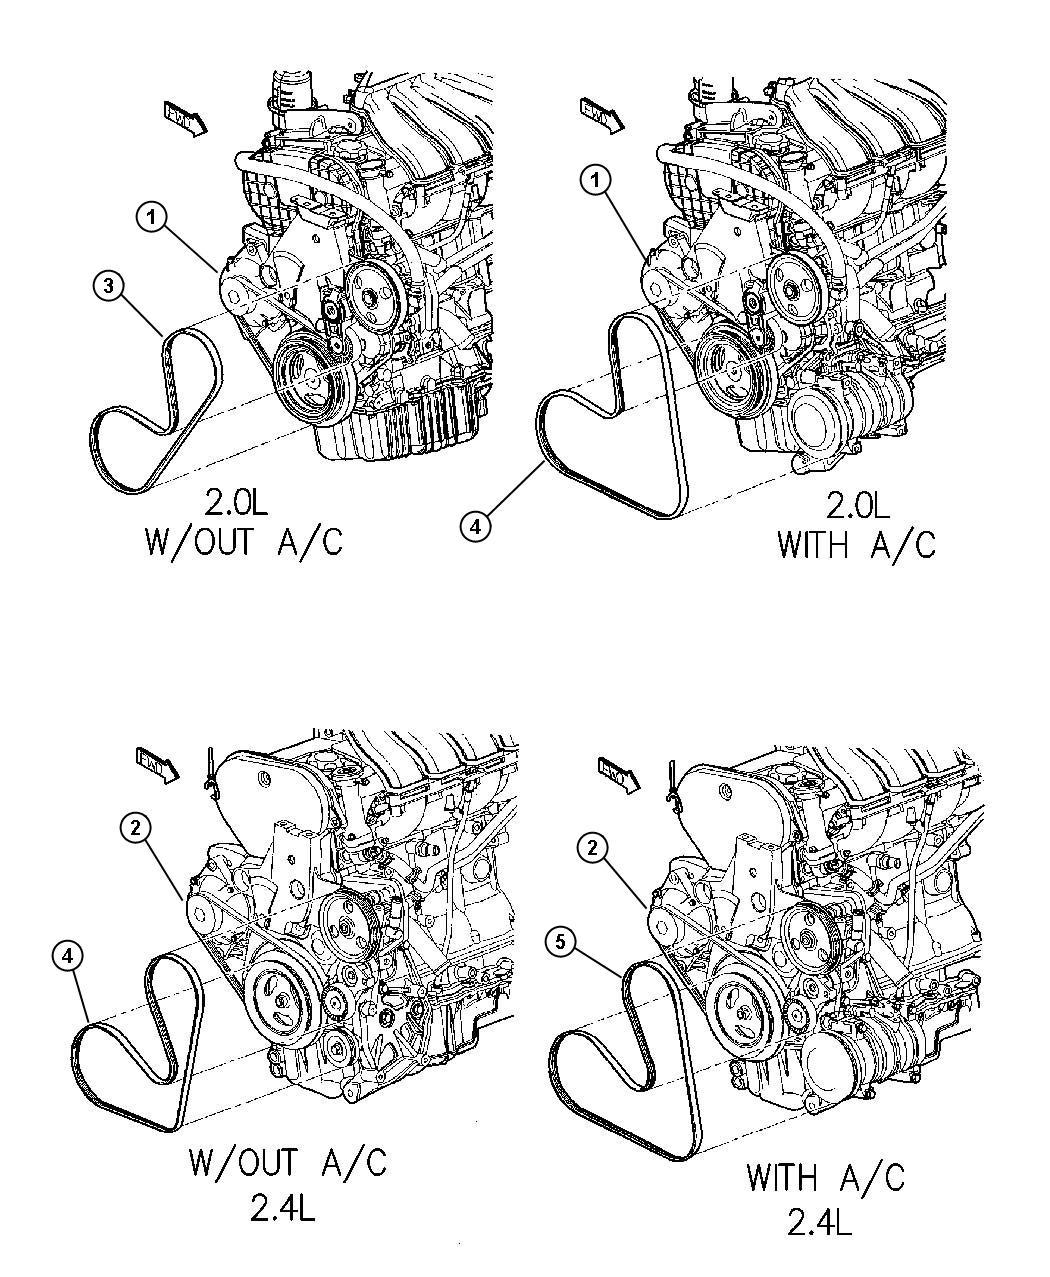 tags: #pt cruiser timing belt problems#2004 pt cruiser water pump#2004 pt  cruiser rear suspension diagram#2004 pacifica belt diagram#2001 pt cruiser  timing